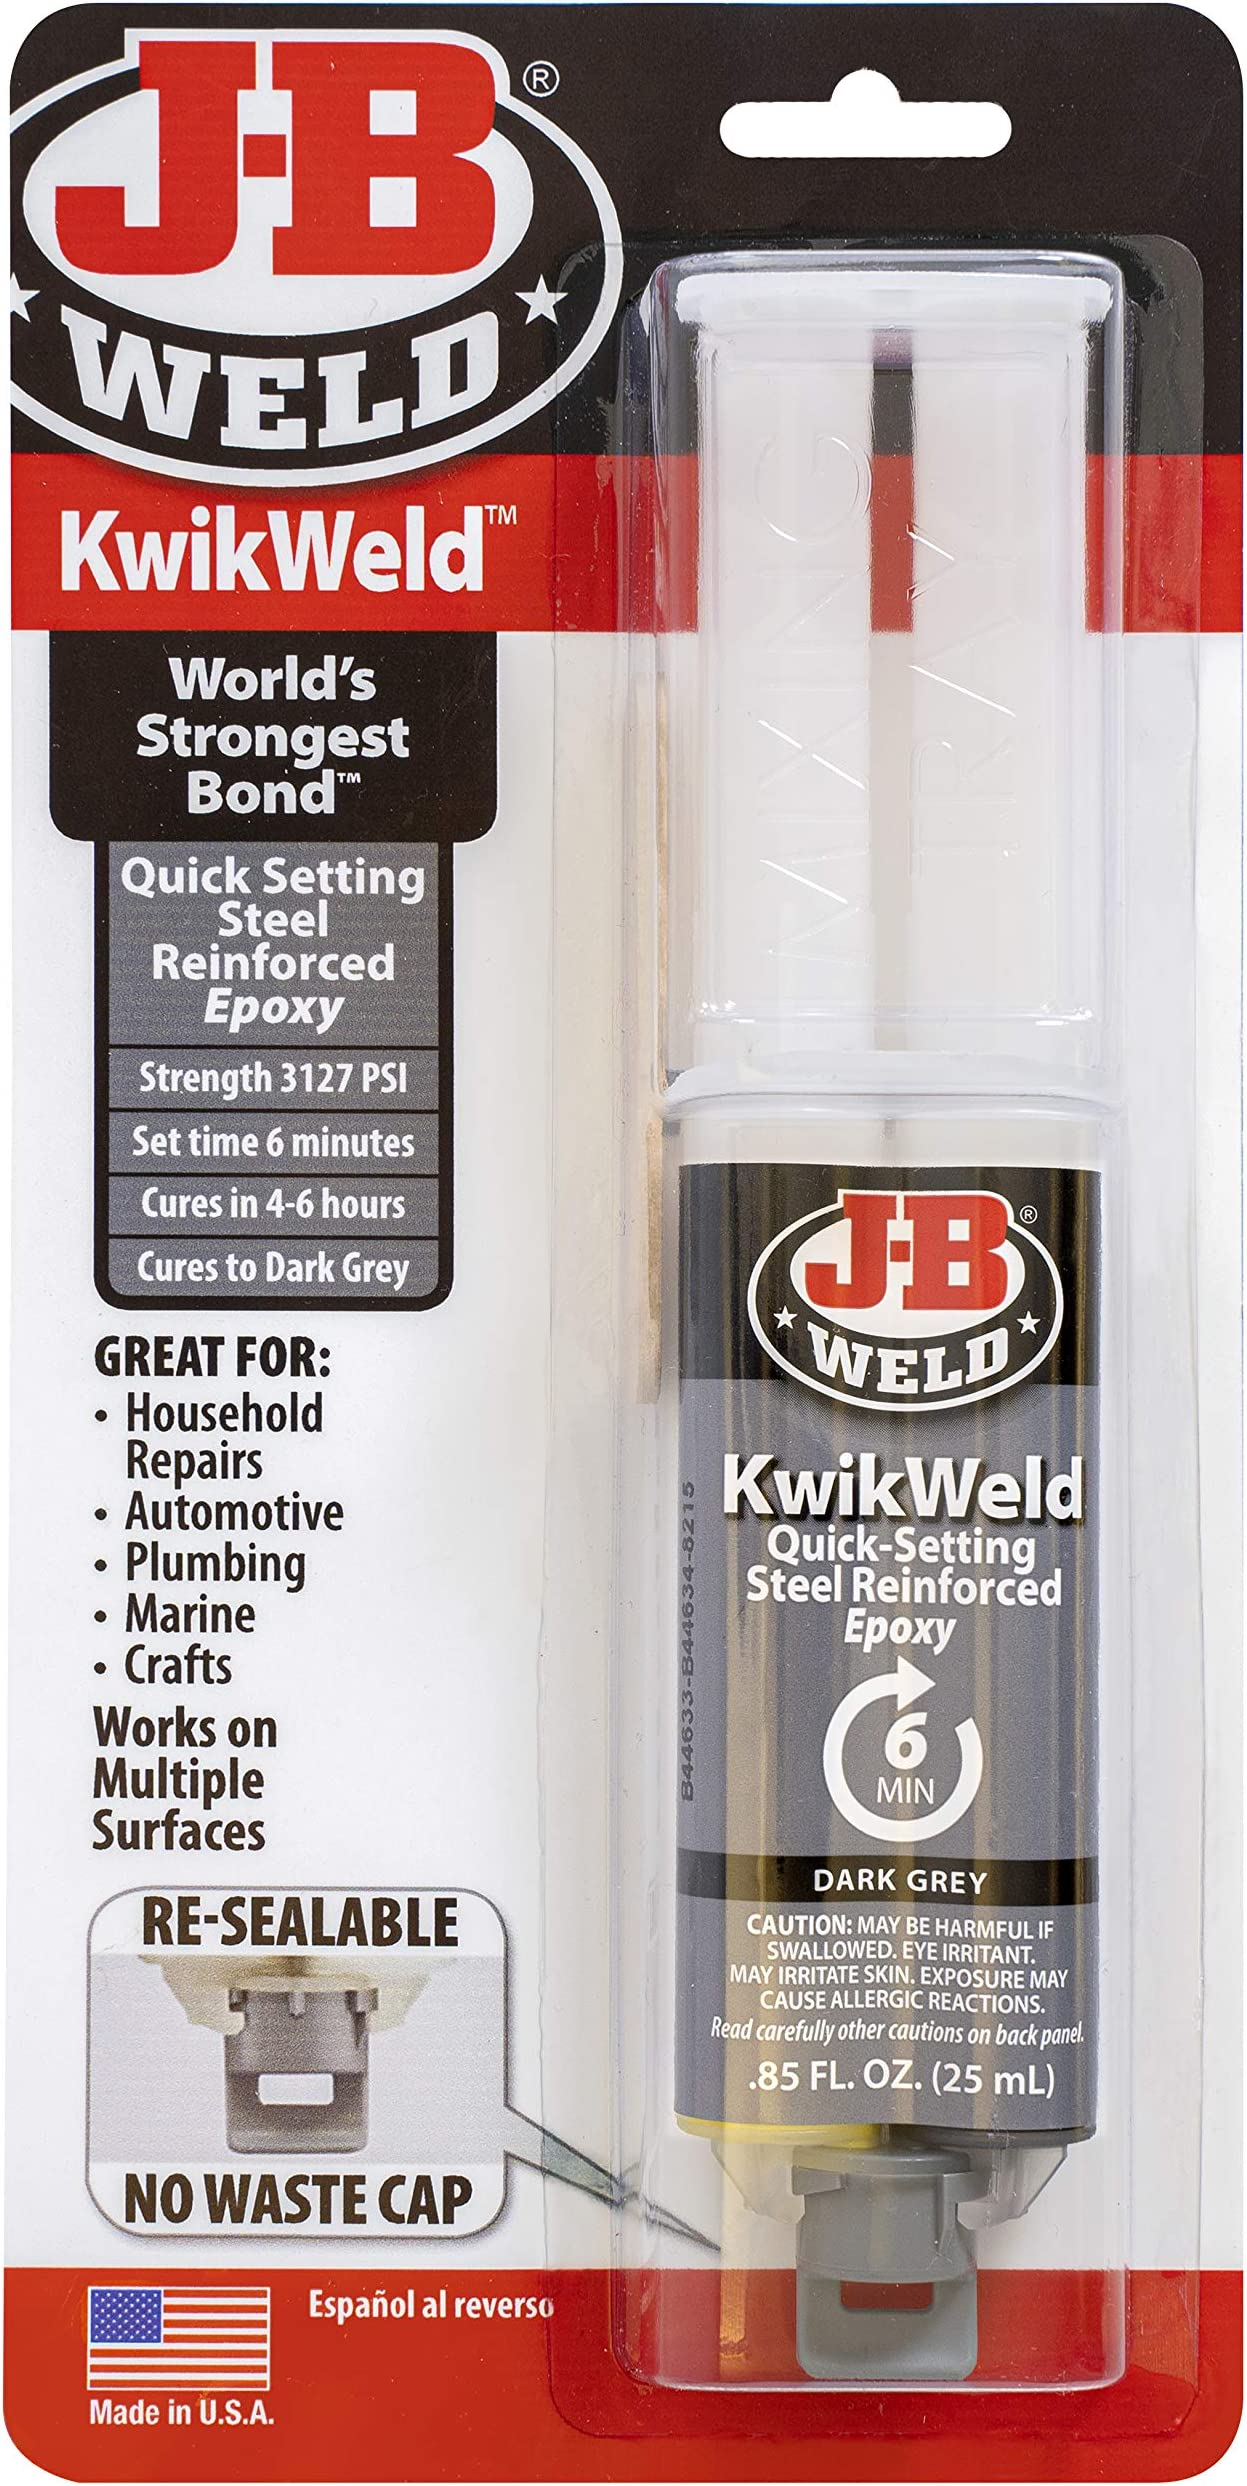 J-B Weld 50176 KwikWeld Steel Reinforced Epoxy Syringe - Dark Grey - 25 ml,Black